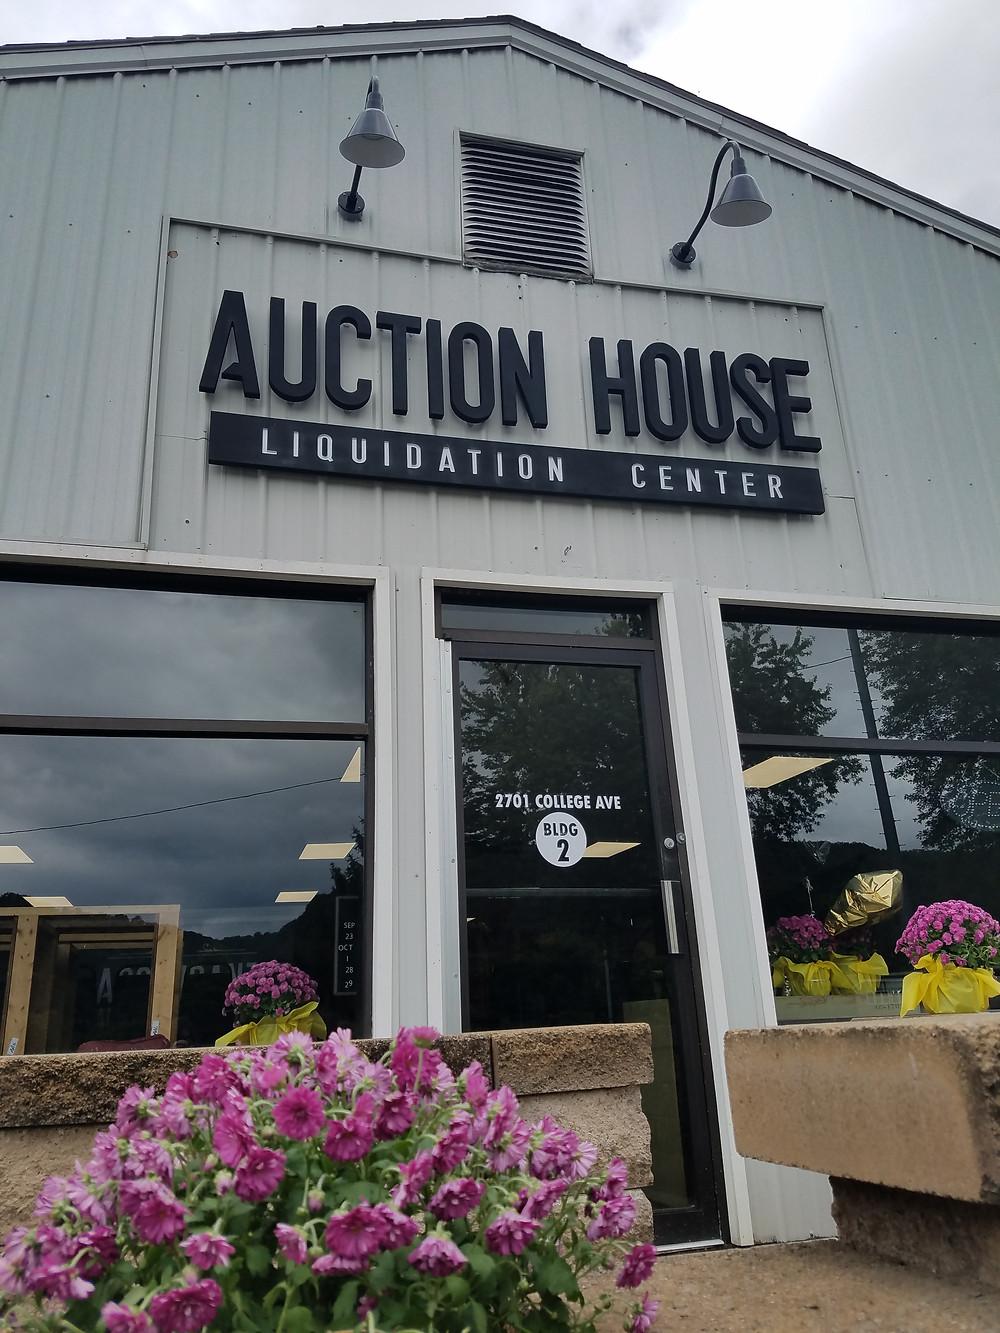 Auction House Liquidation Center Bldg. 2